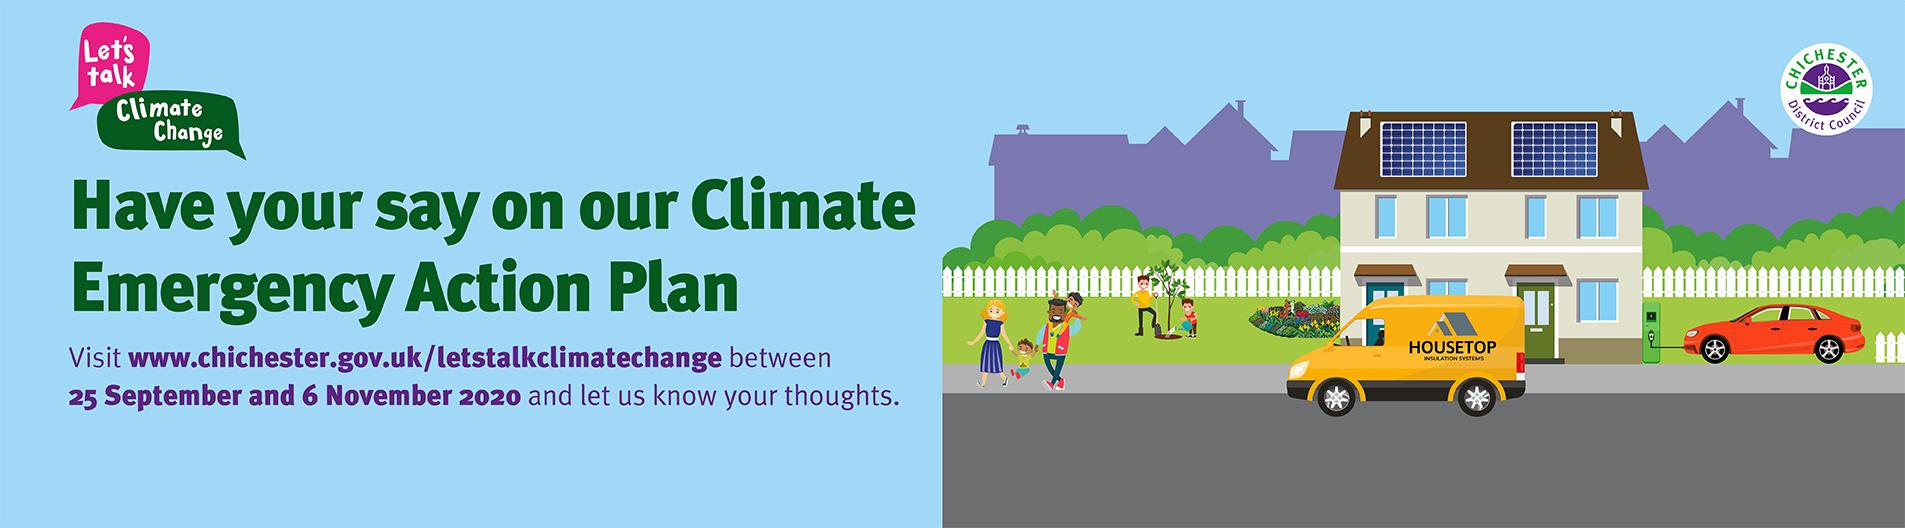 Let's Talk: Climate Change